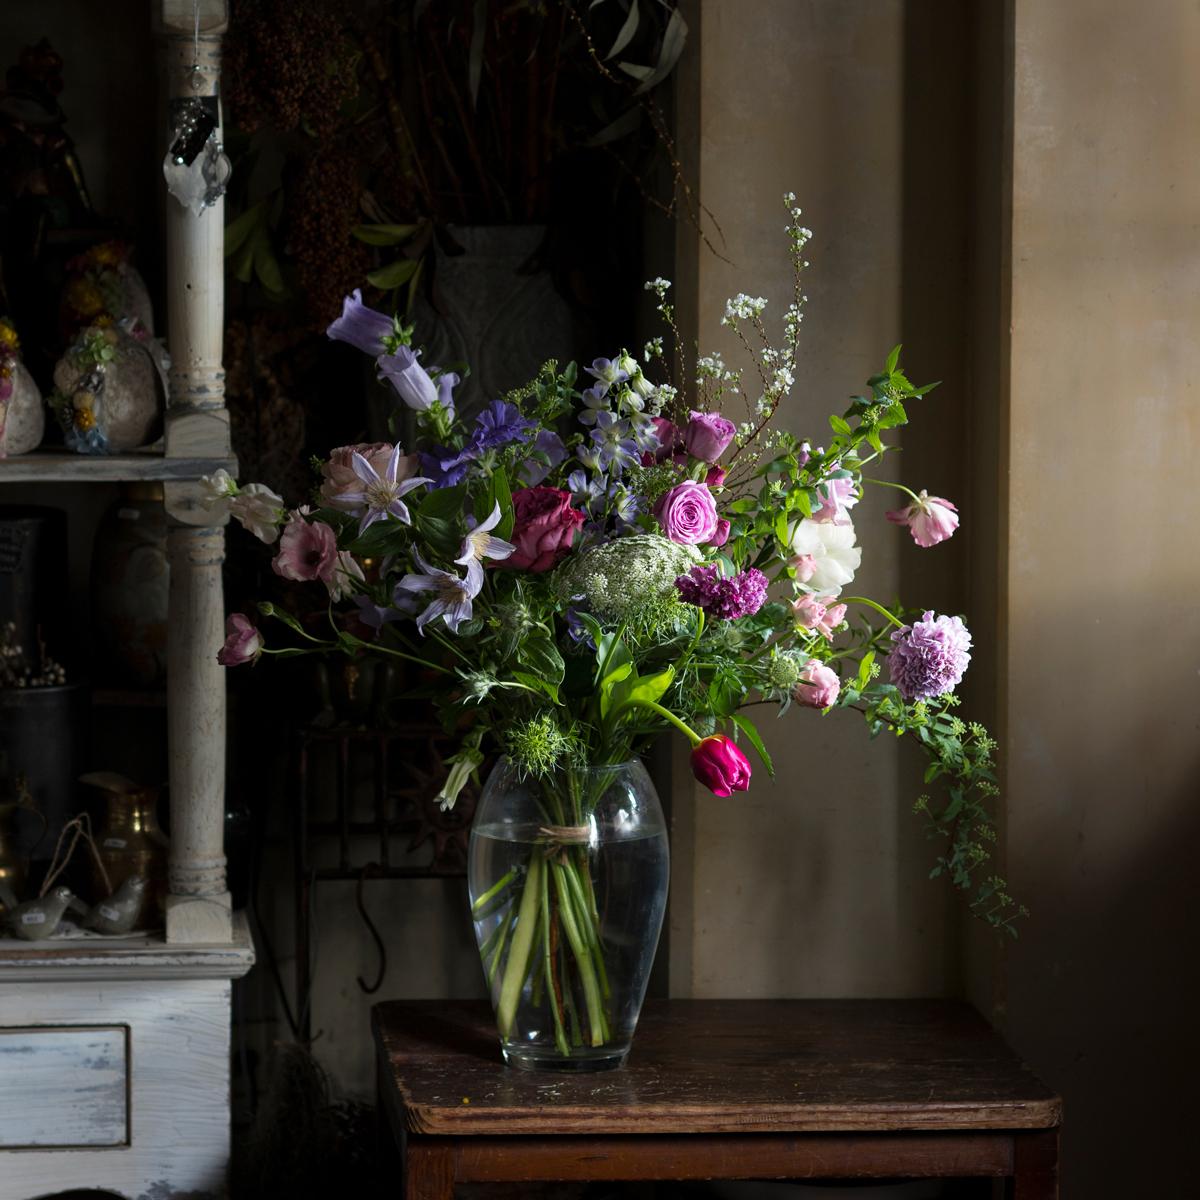 jardin nostalgique 店頭からお届け!季節の花いろいろL